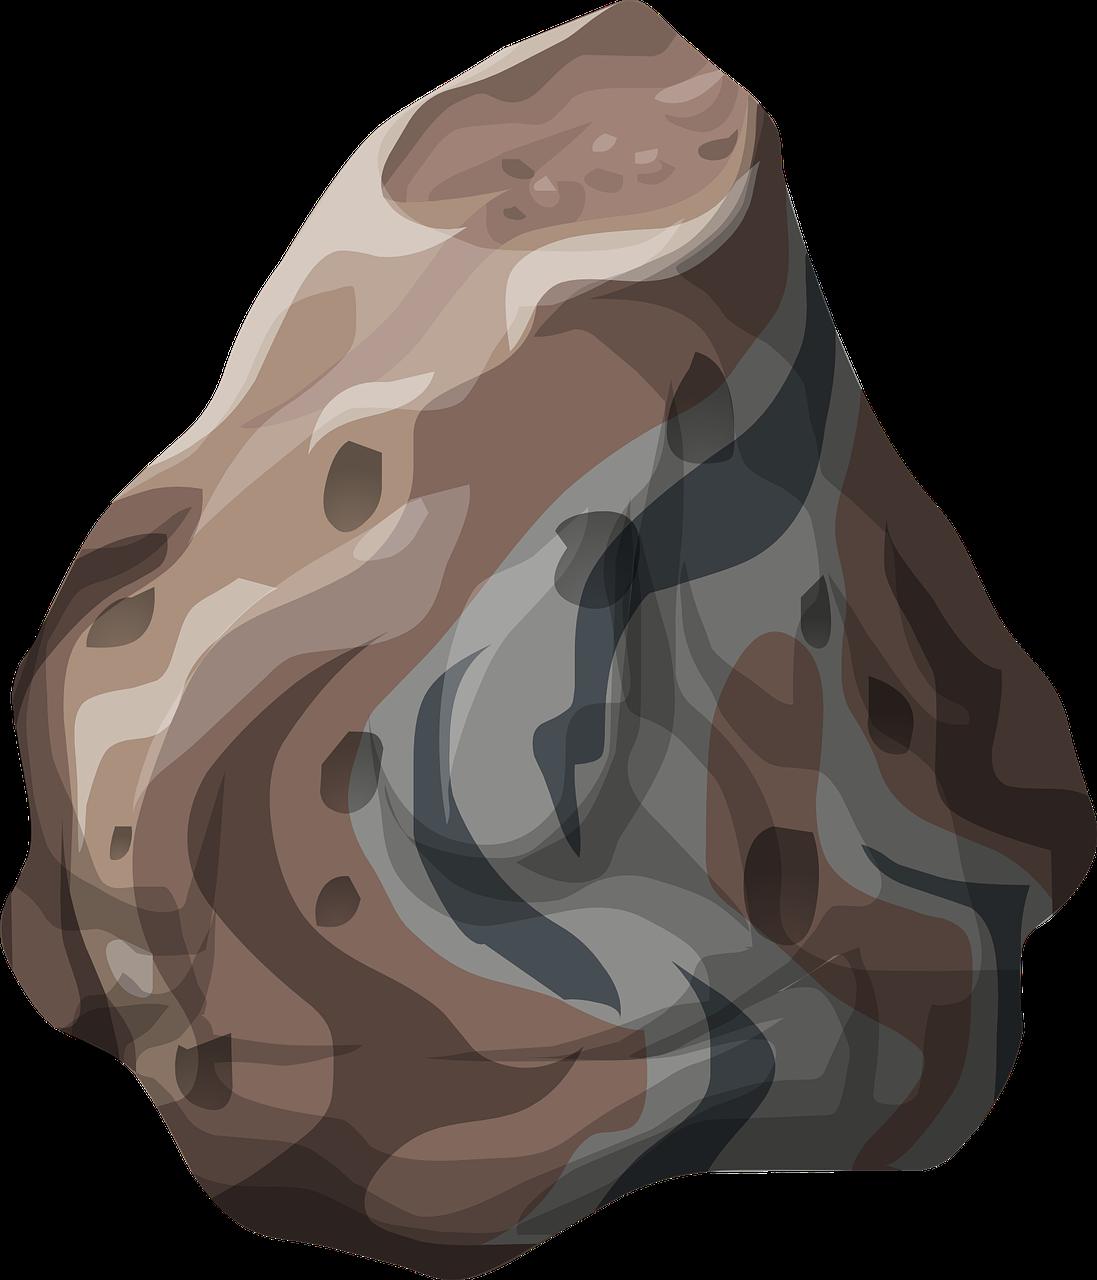 graphic Rock underwater free on. Rocks clipart